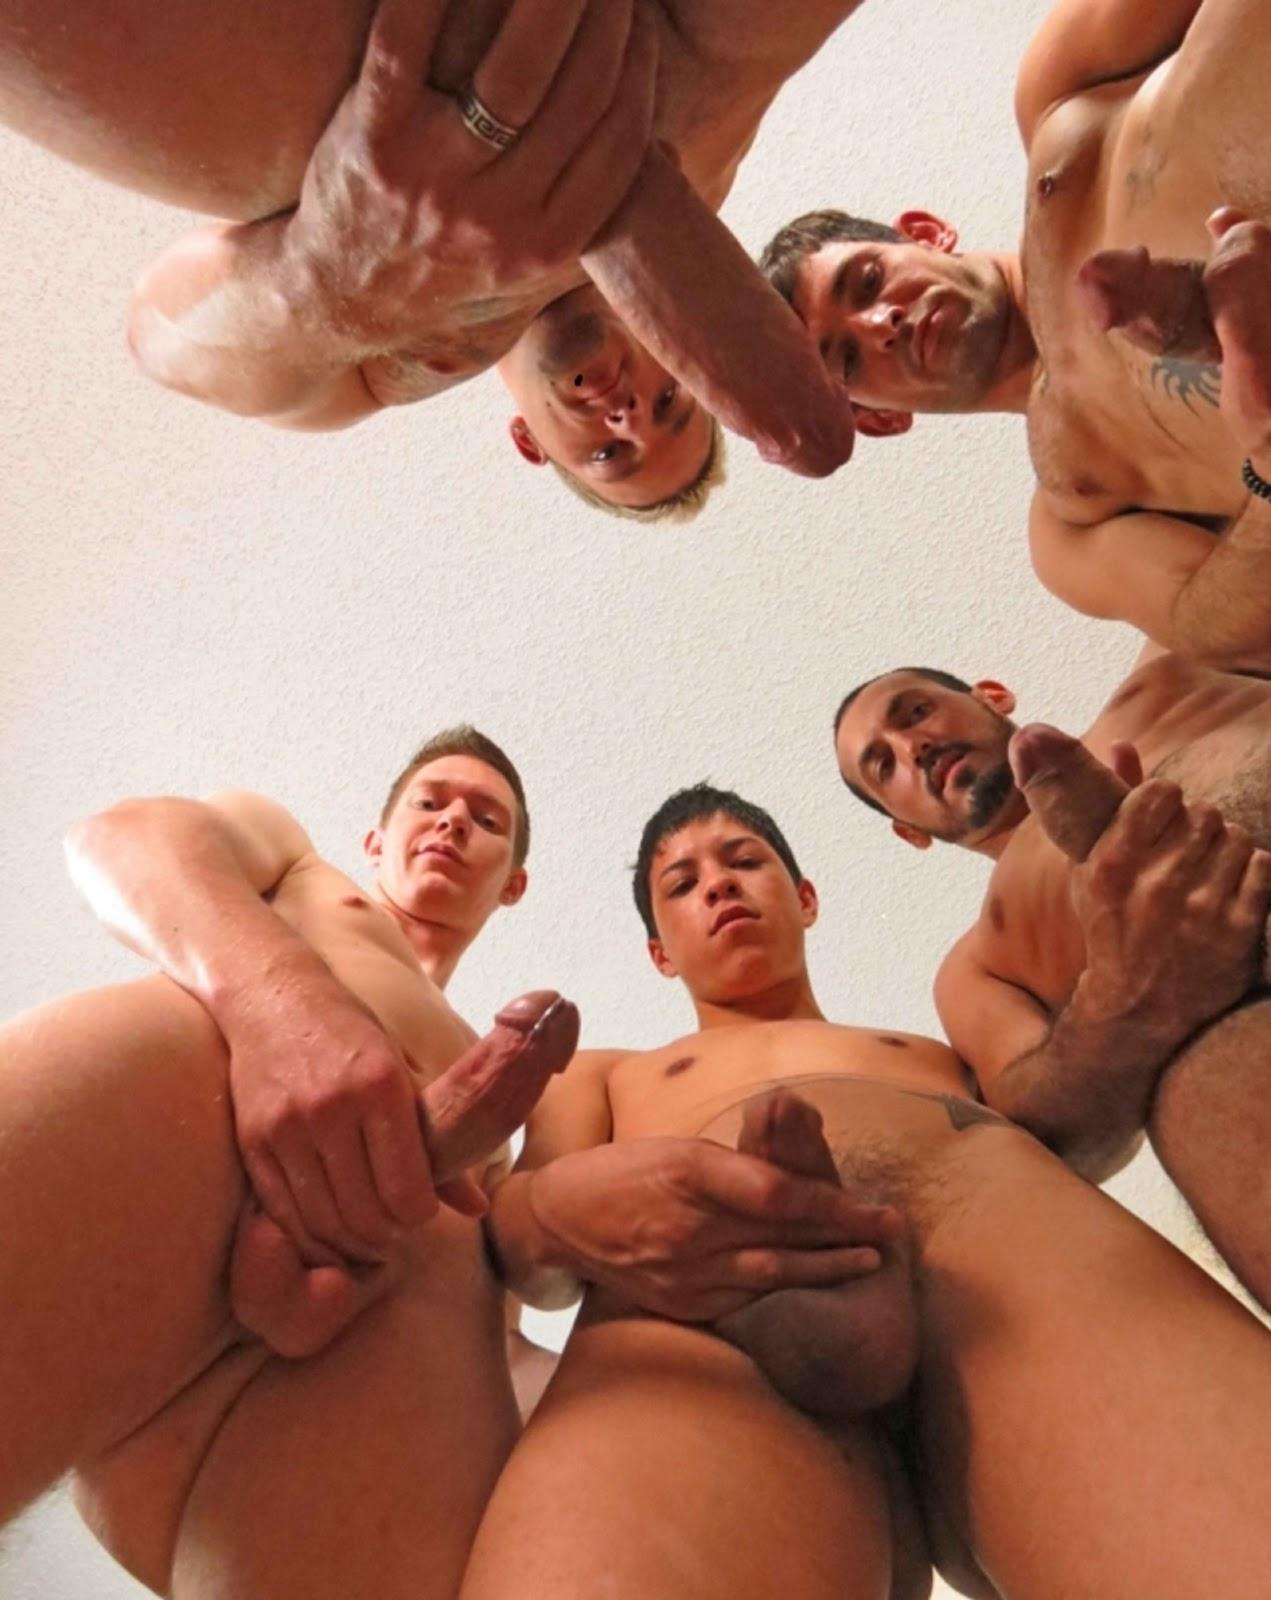 Circle jerk orgy